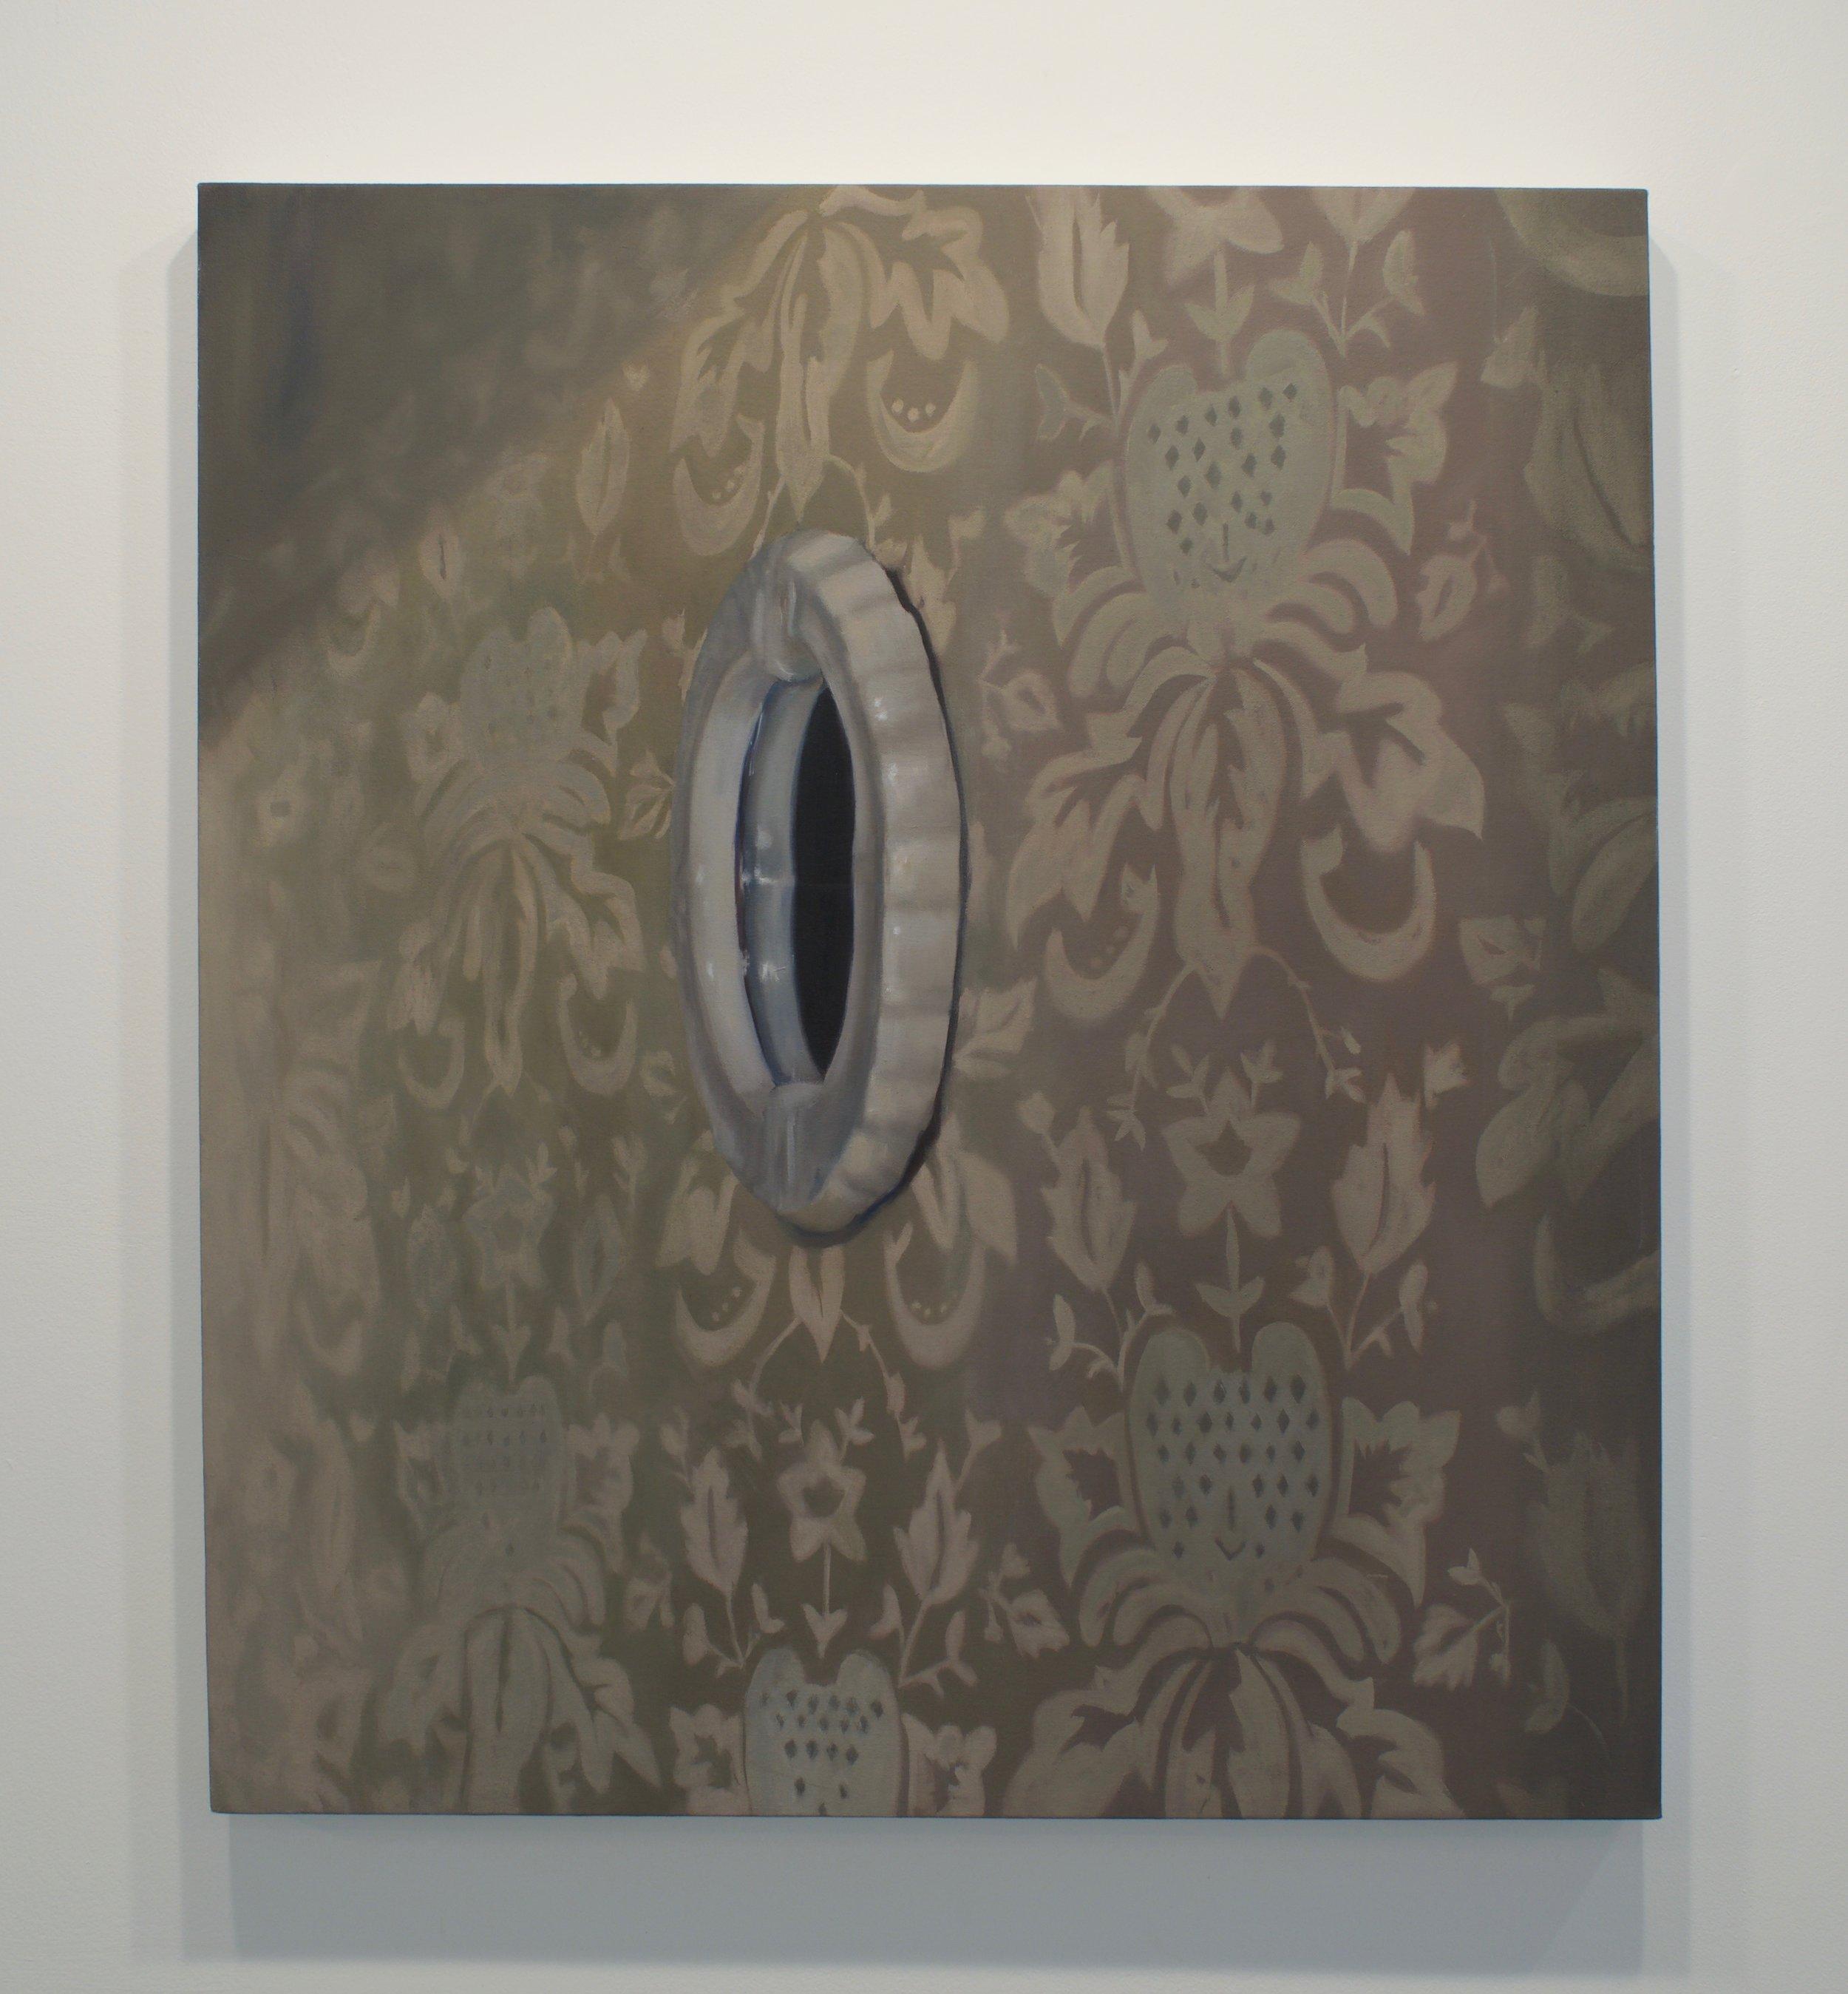 Emily Quinn, Portal, 2016. Oil on canvas, 42 x 36 in.